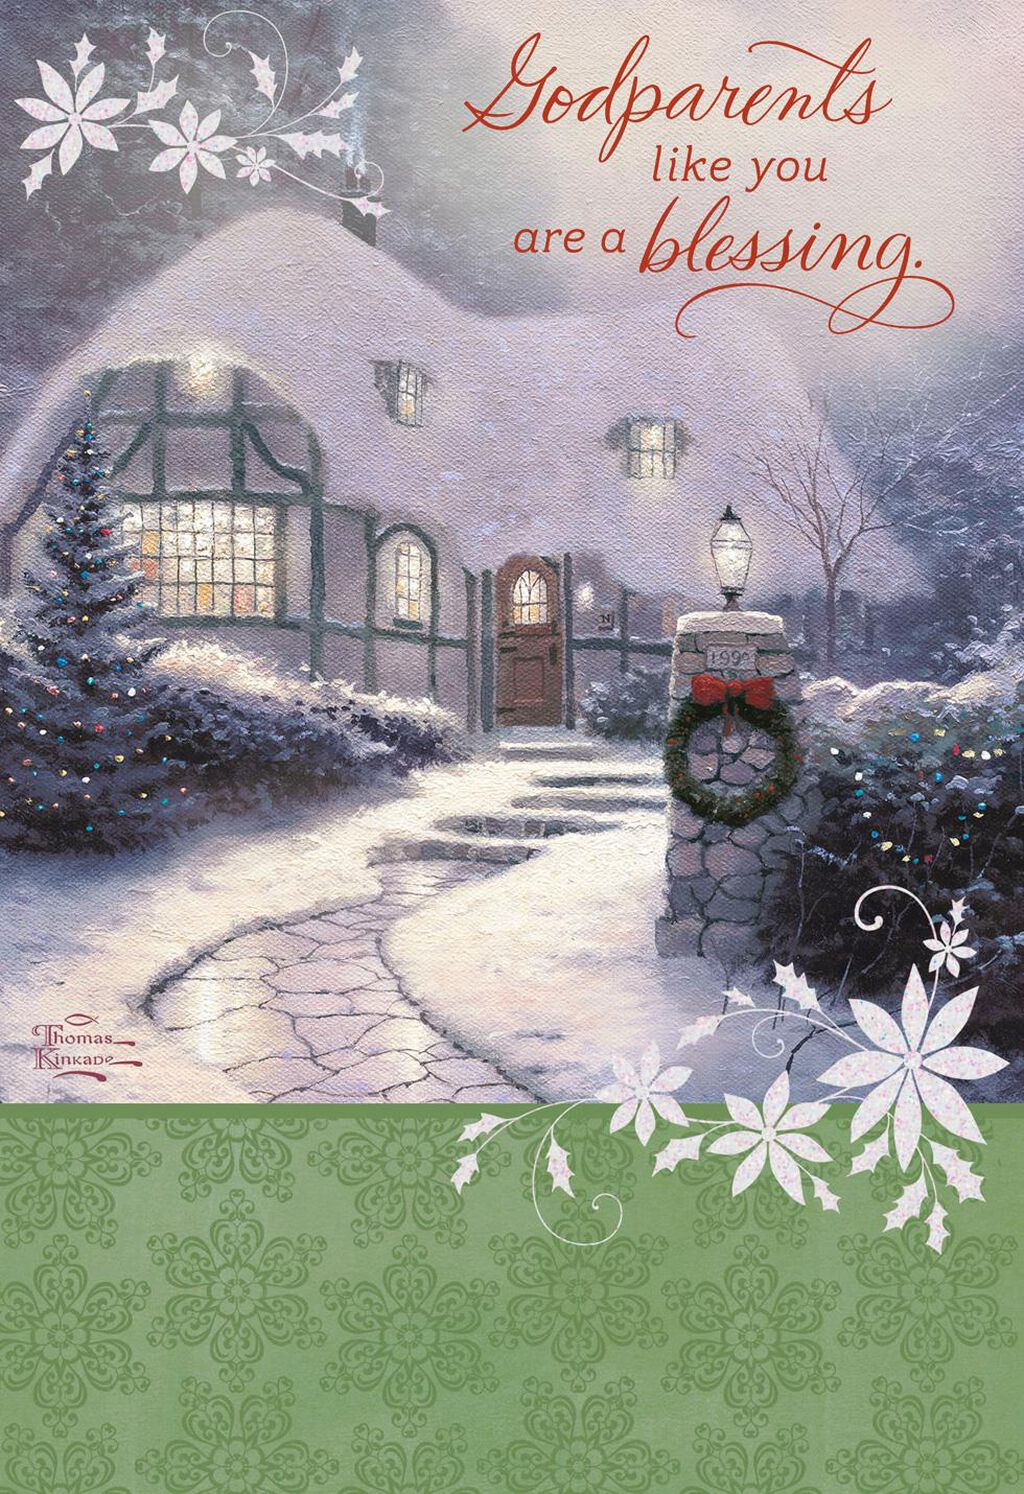 Thomas Kinkade Youre A Blessing Godparents Religious Christmas